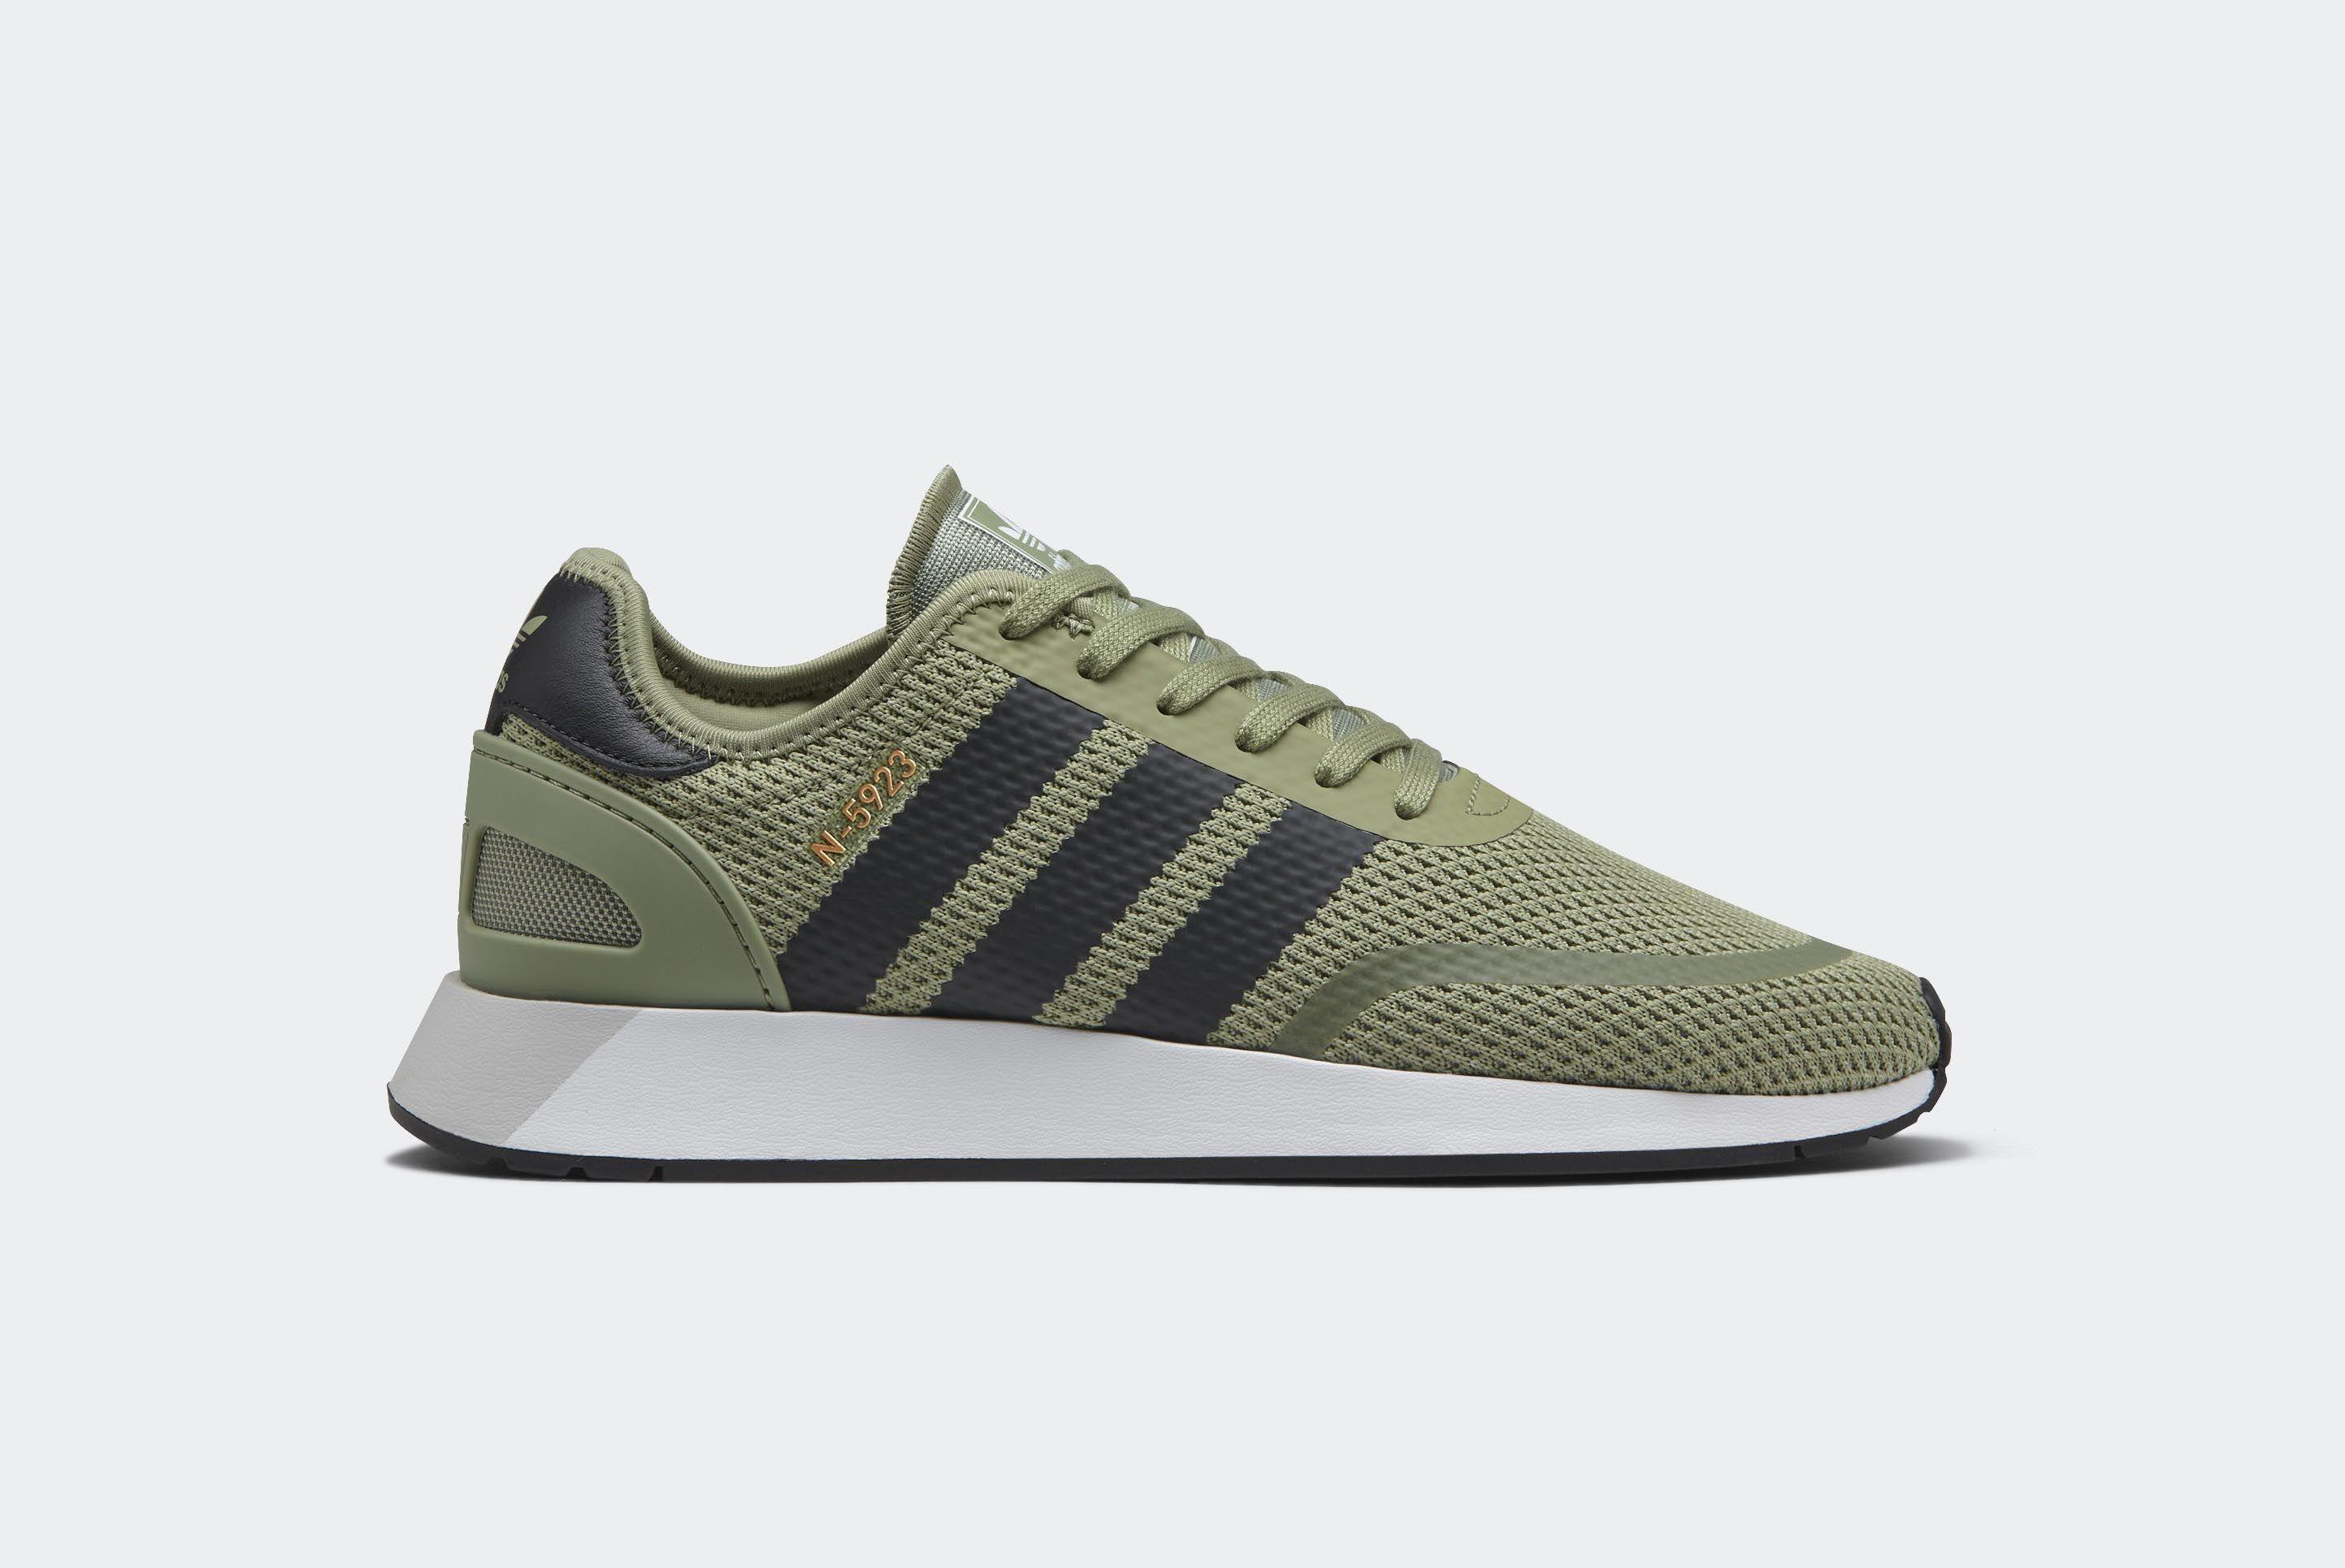 Adidas N 5923 6 E1521479395512 Sneaker Freaker